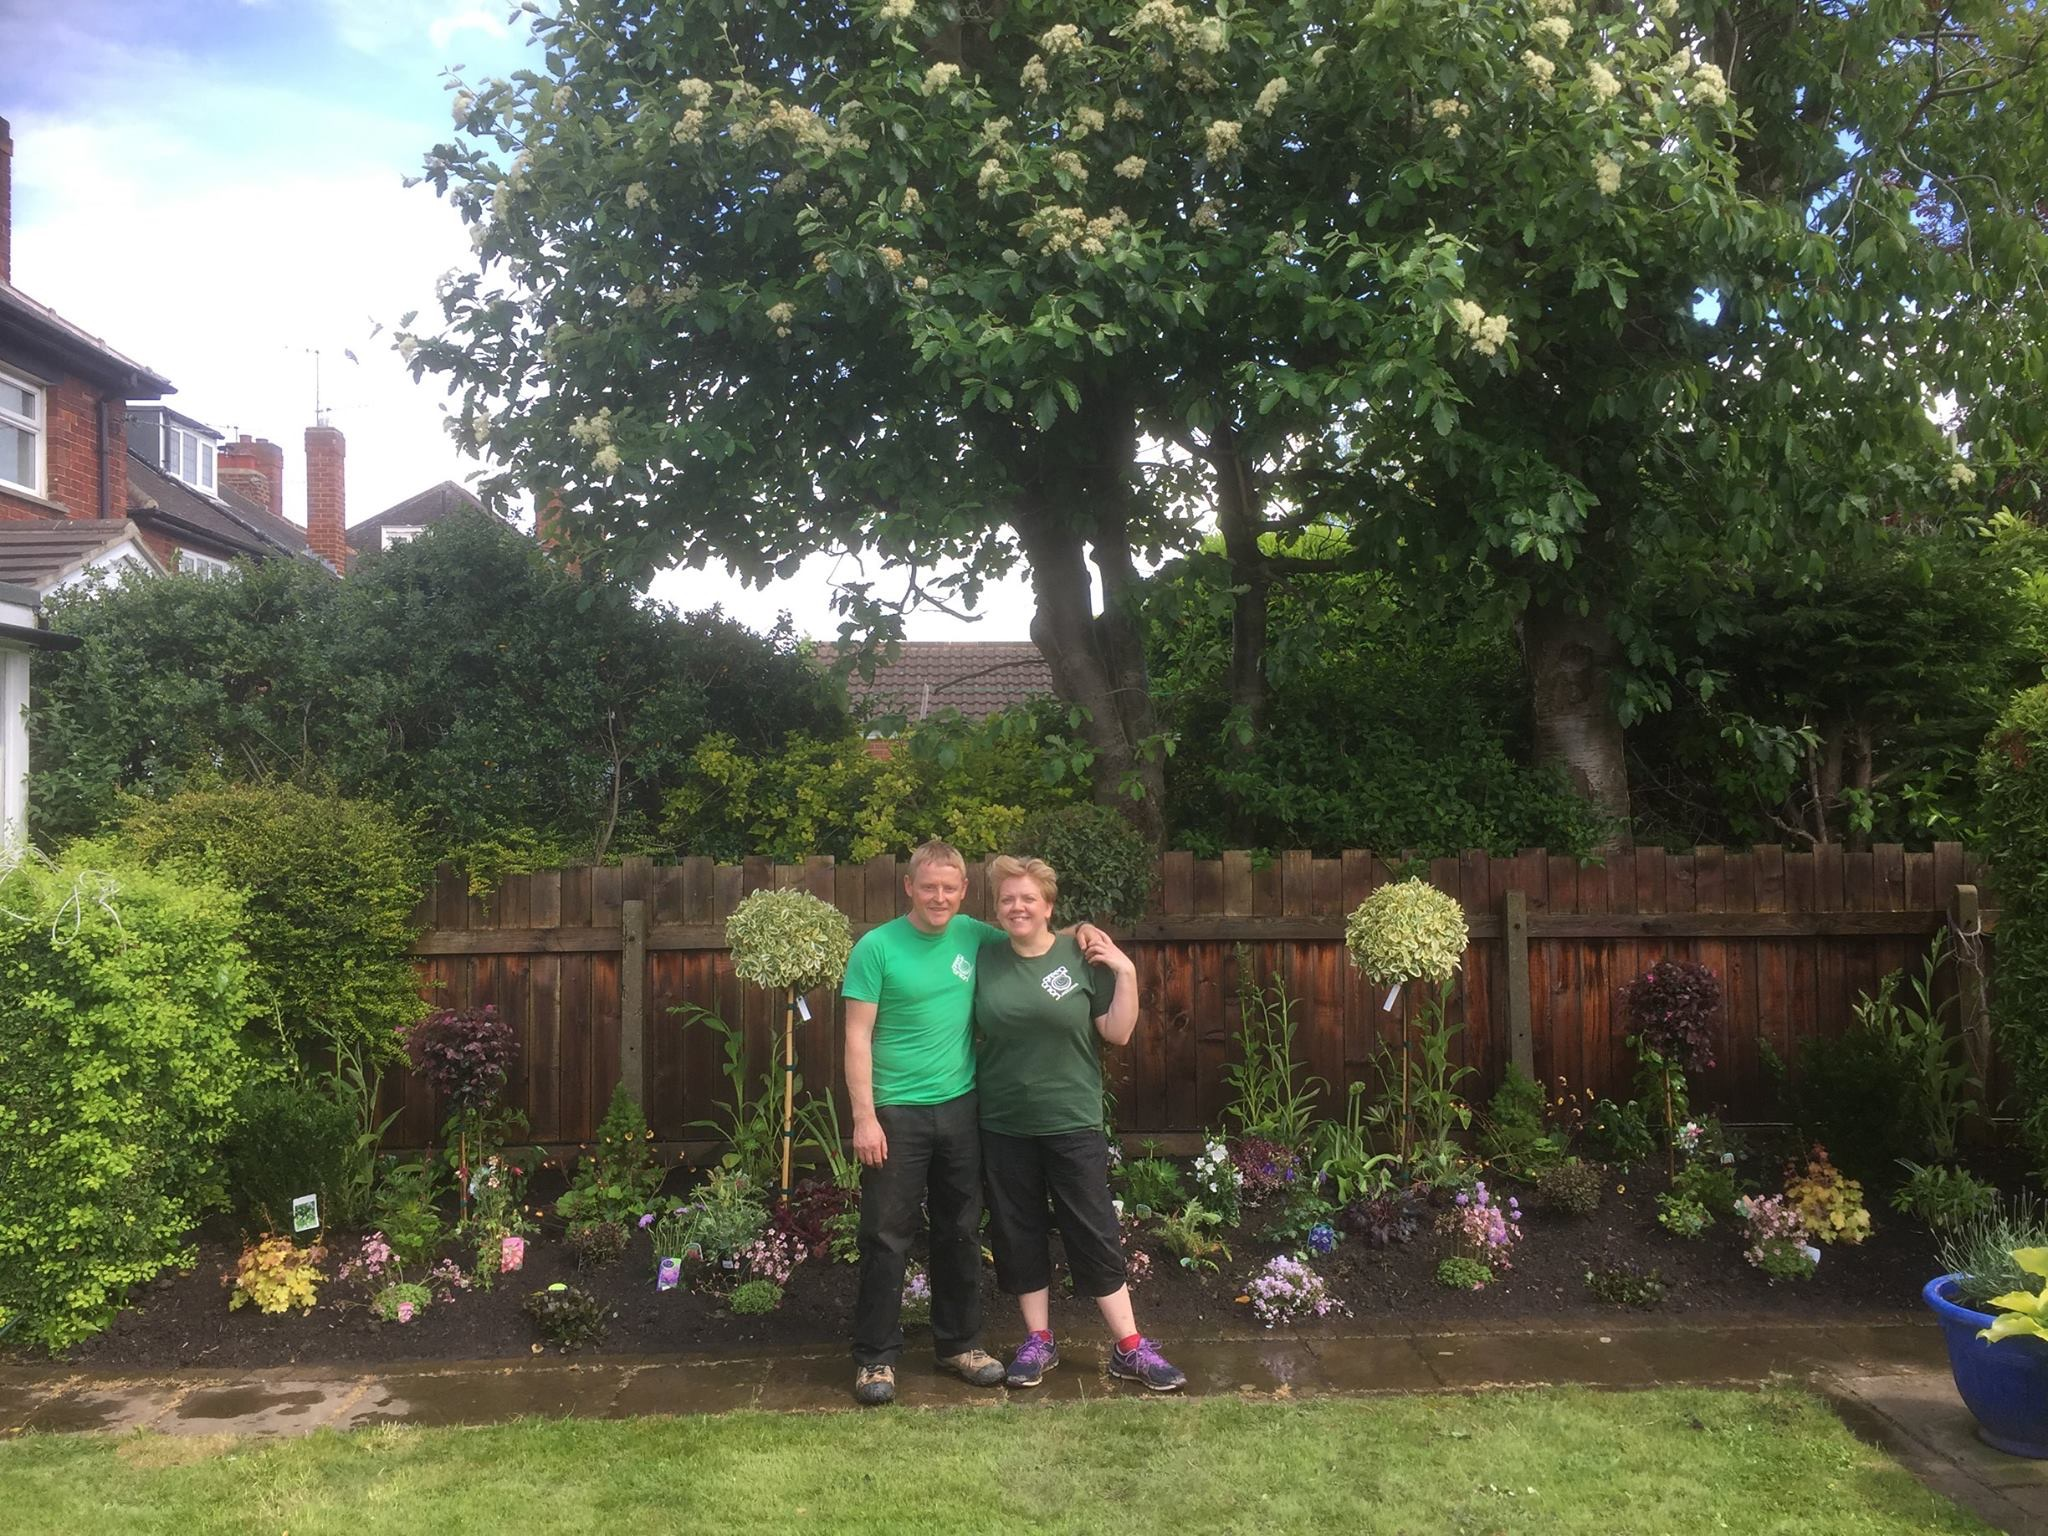 Designing-garden-borders-Landscaping-Green-Onion ...